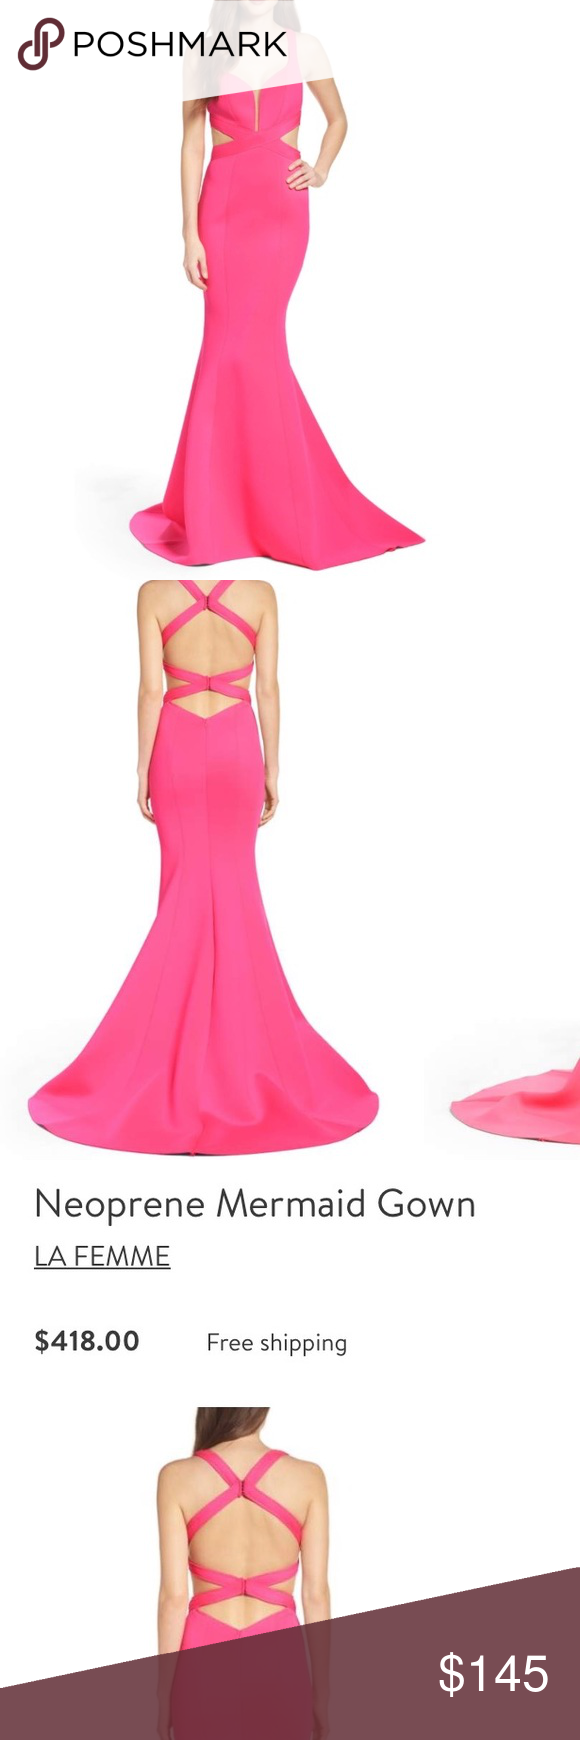 La Femme gown | Costura